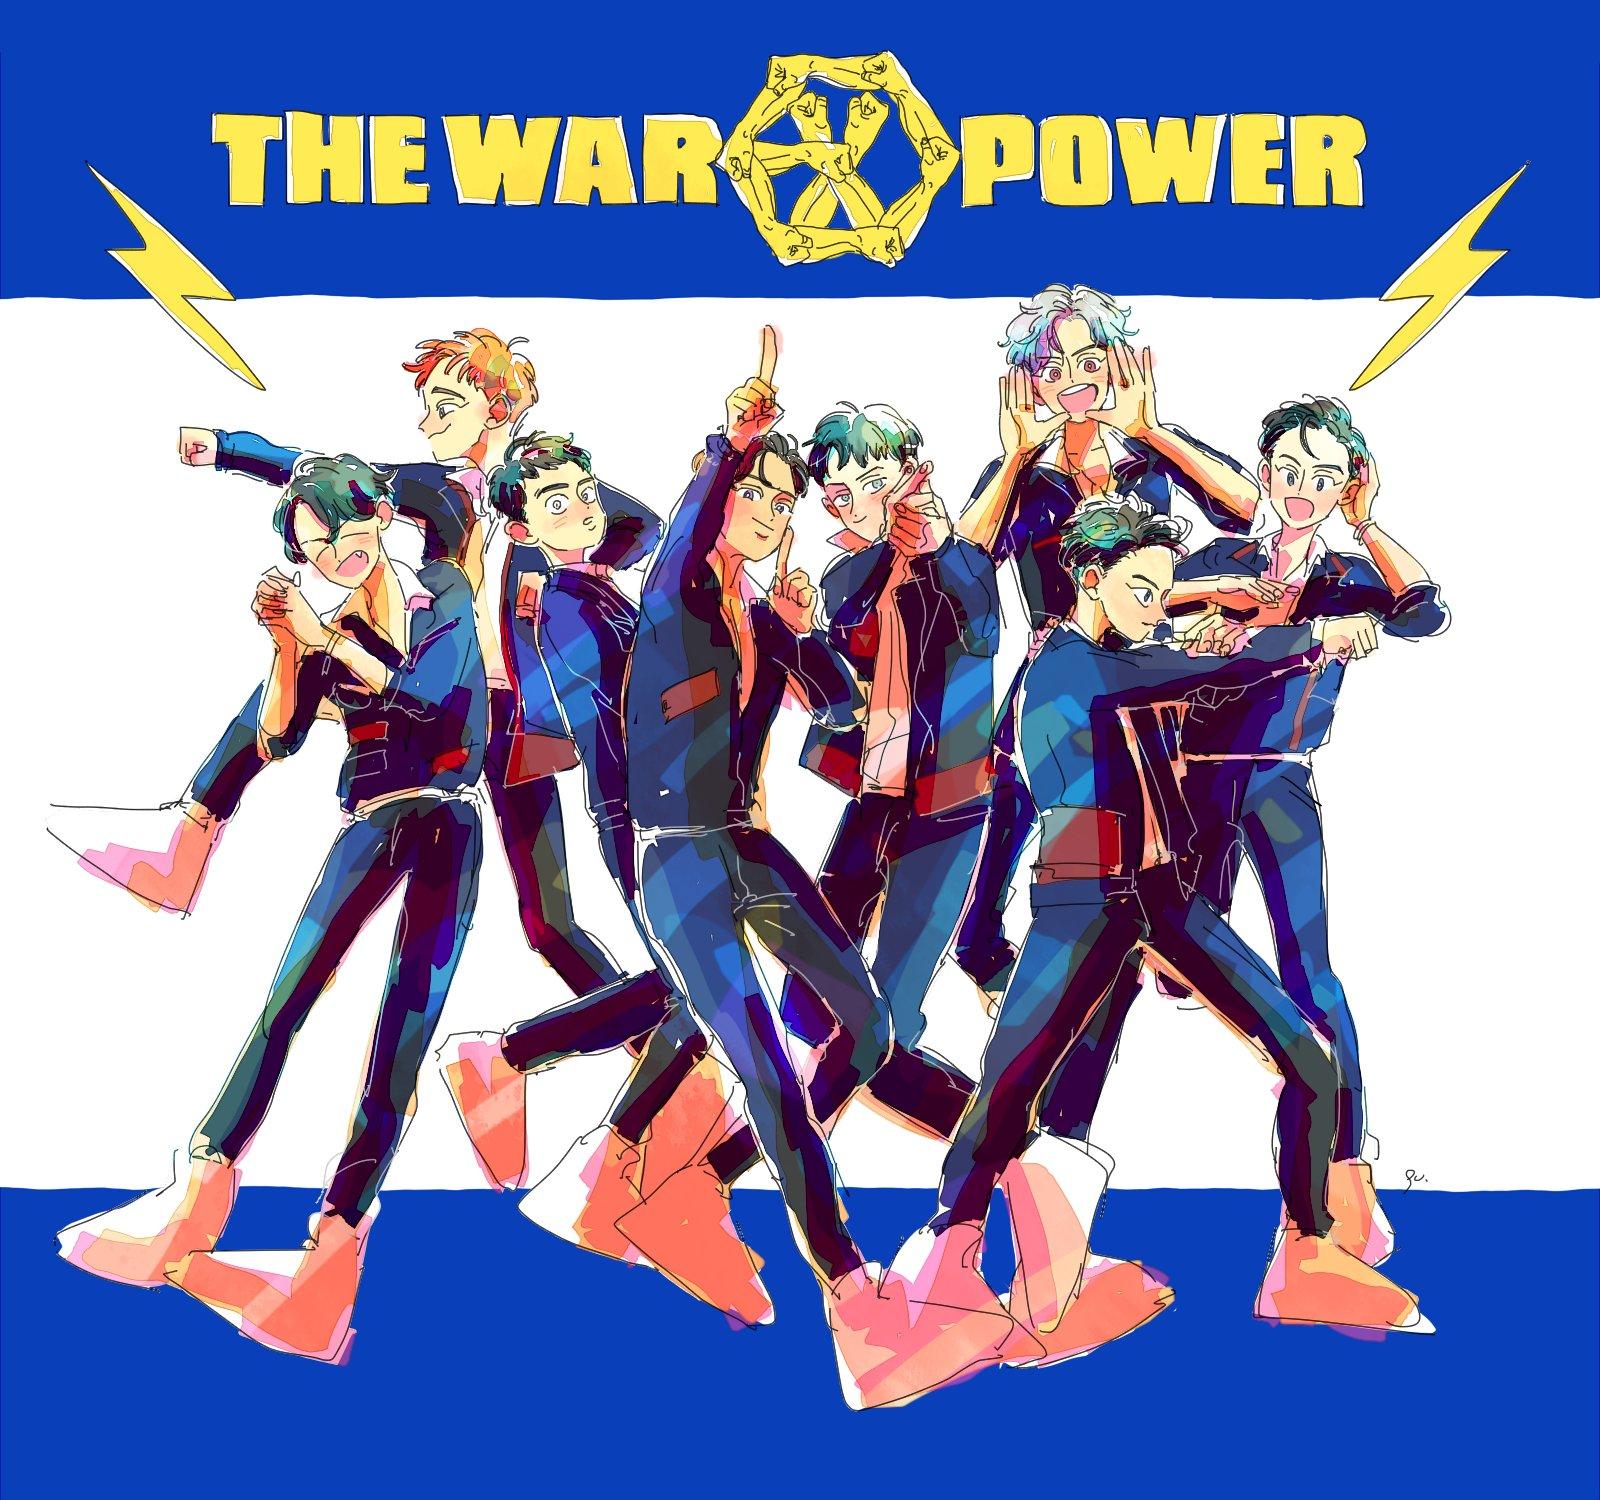 ������ #EXO #Power #TheWar #ThePowerofMusic https://t.co/yh6niquVDu